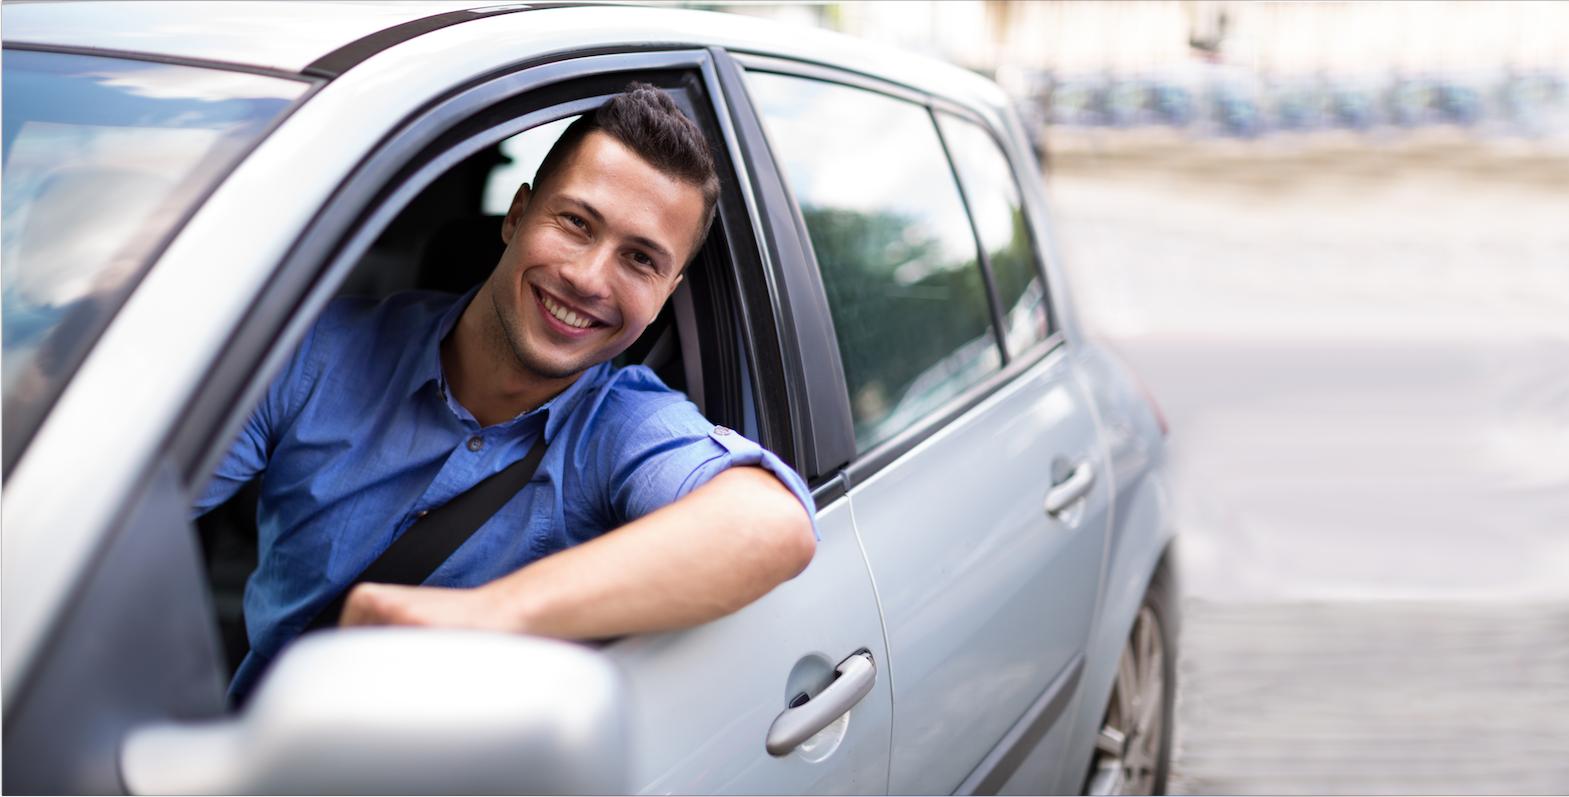 Driver in a Getaround® shared car